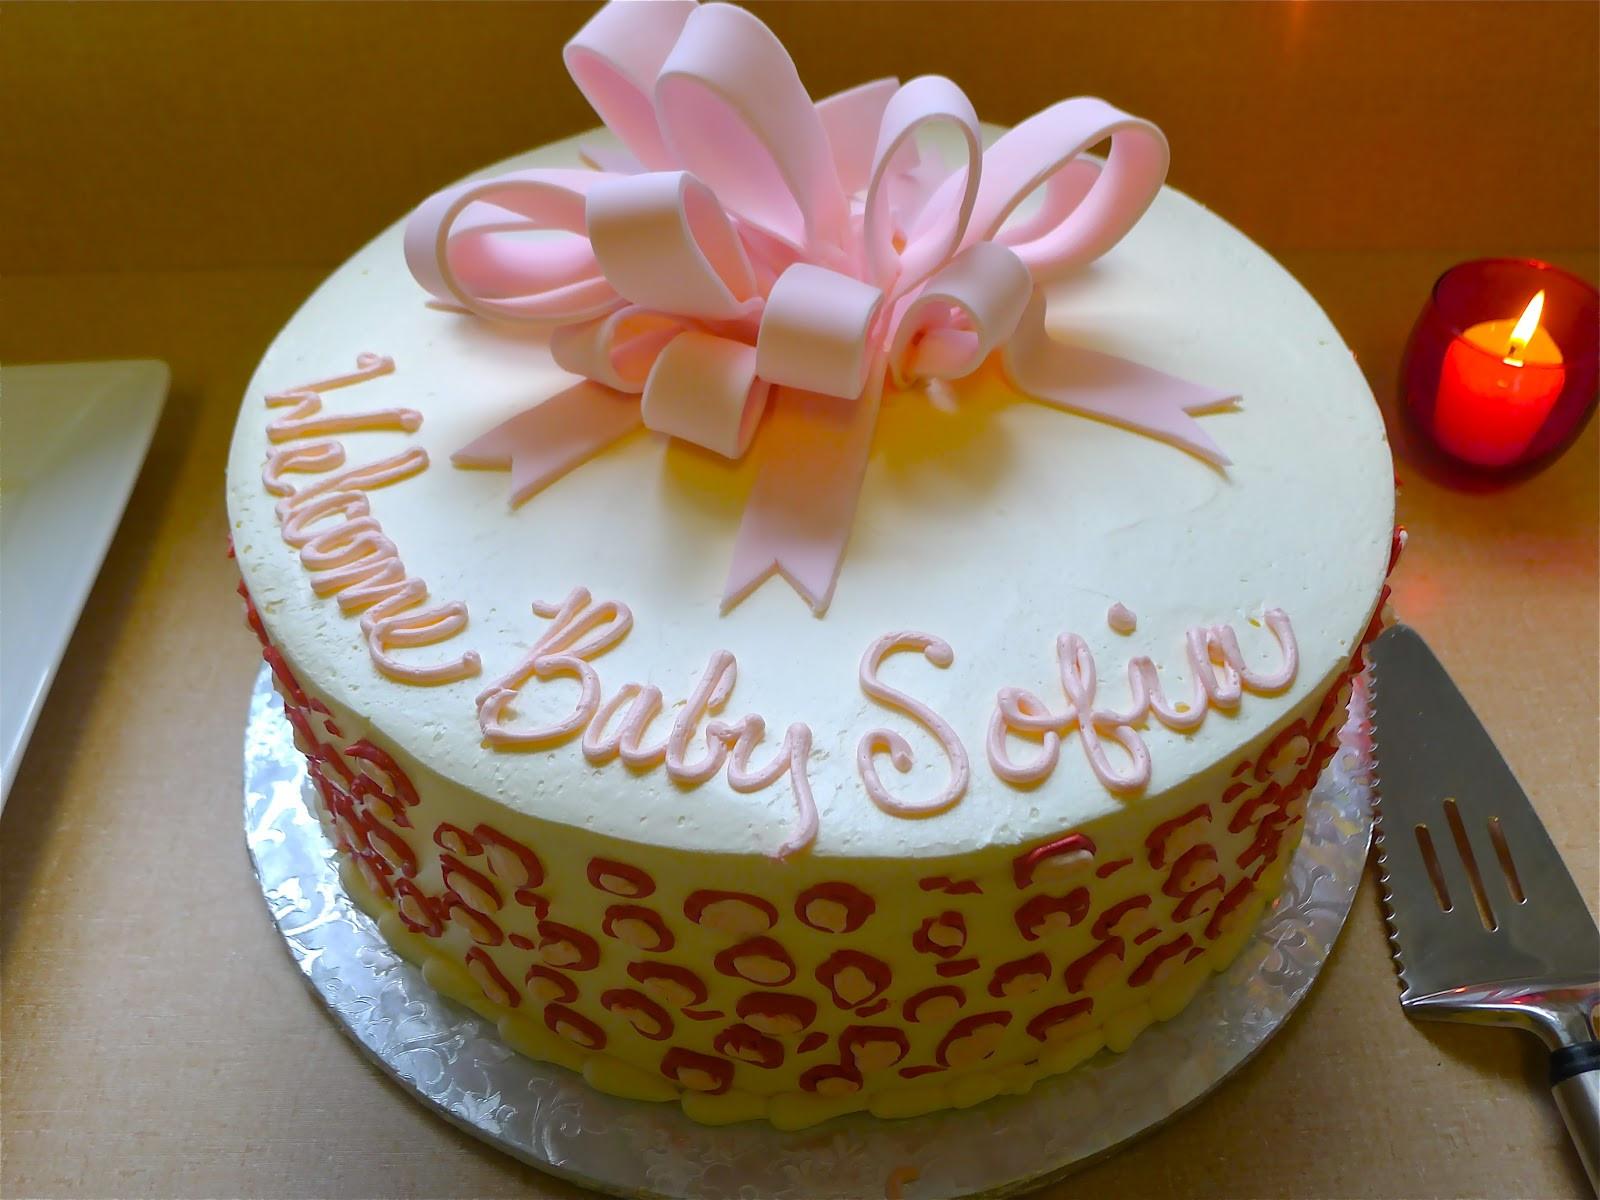 DIY Baby Shower Cakes  Fashionably Festive Pink Baby Shower DIY Towel Cake